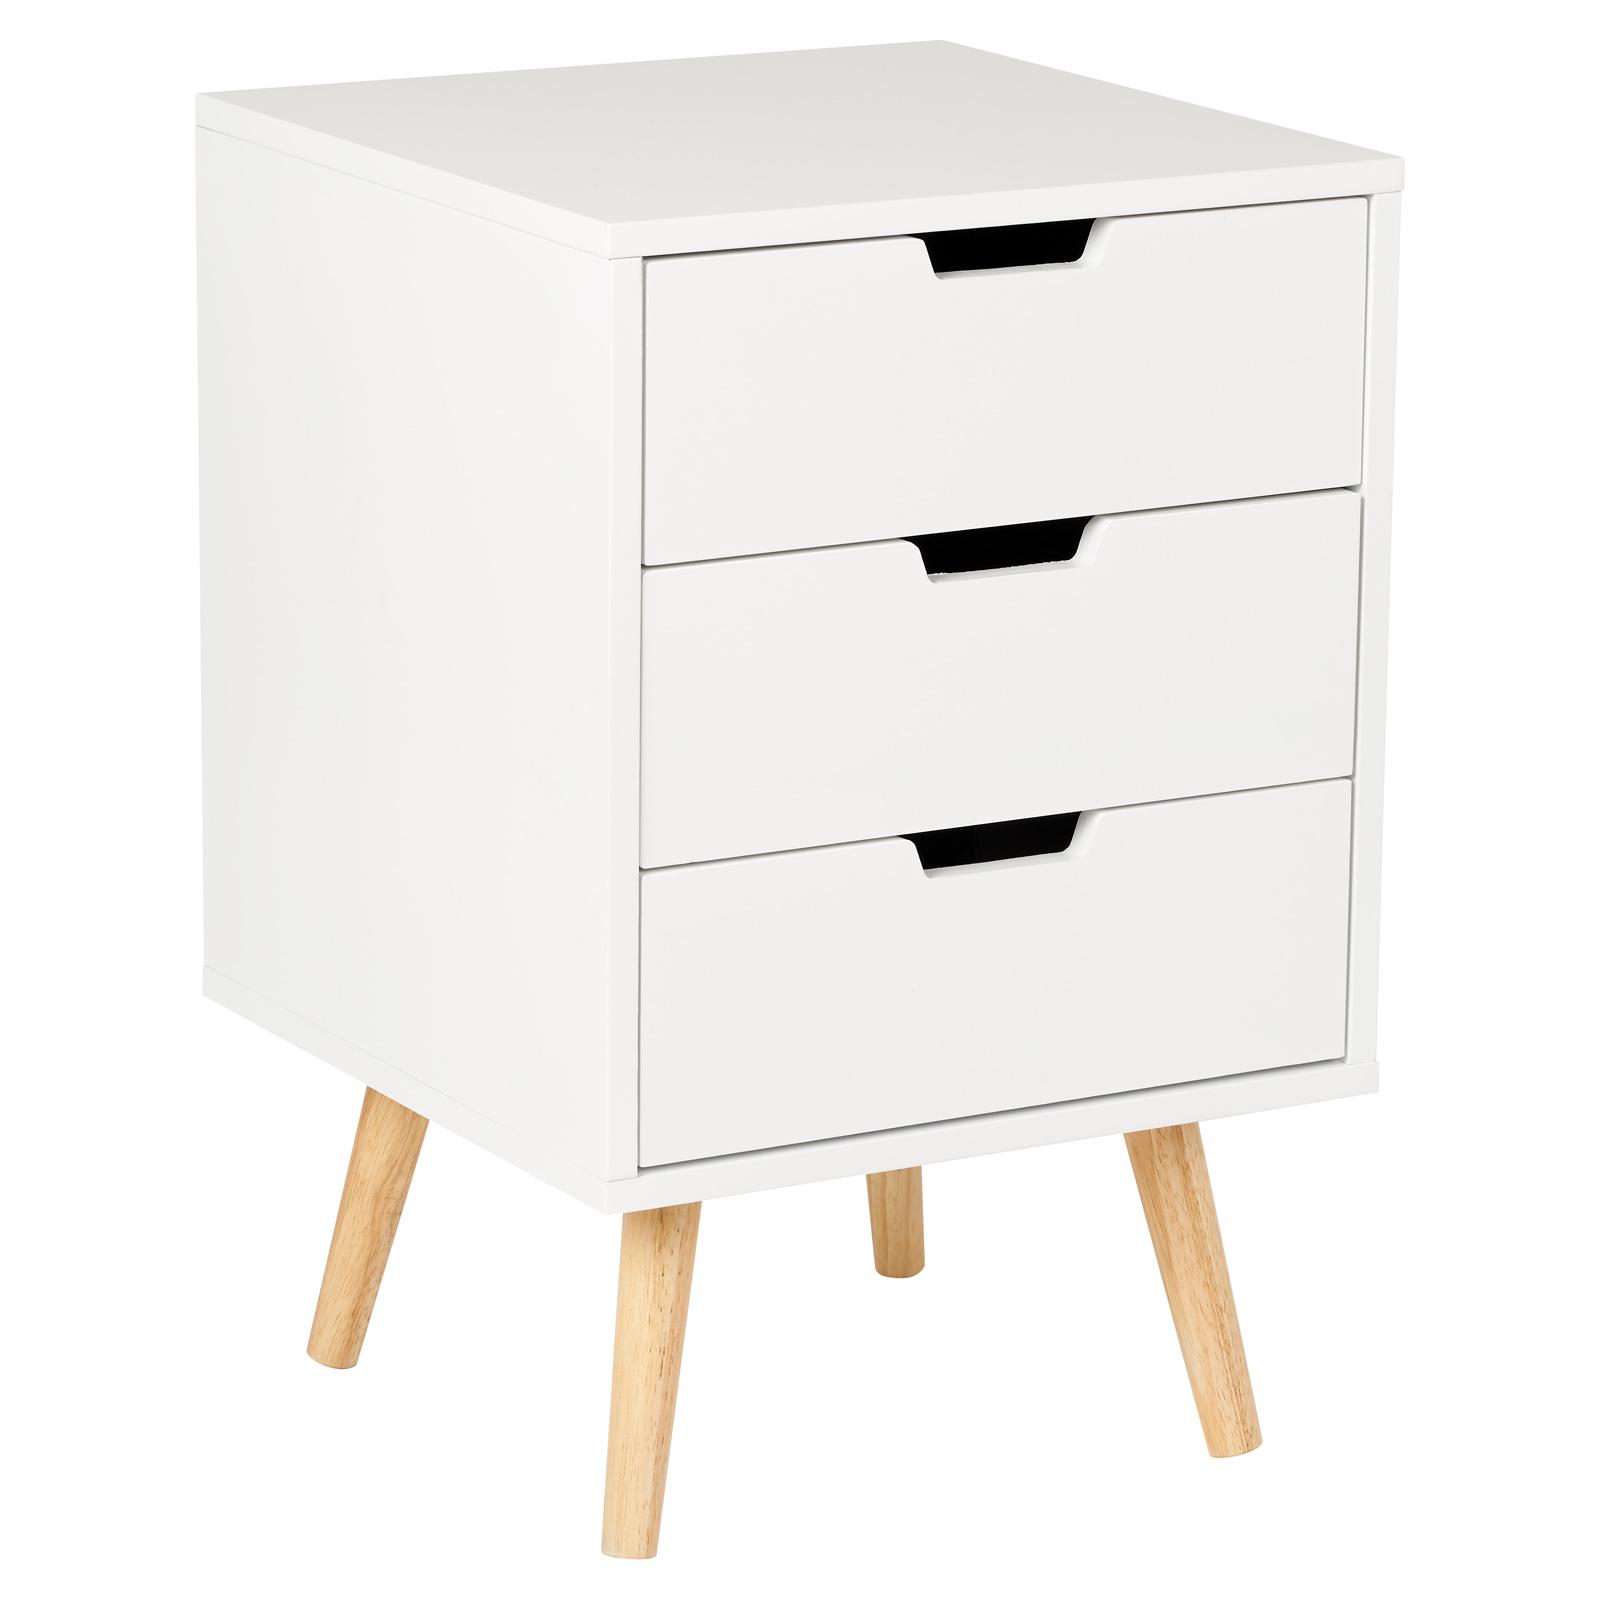 sentinel hartleys table chevet nuit rtro 3 tiroir blanc meuble chambre design scandinave